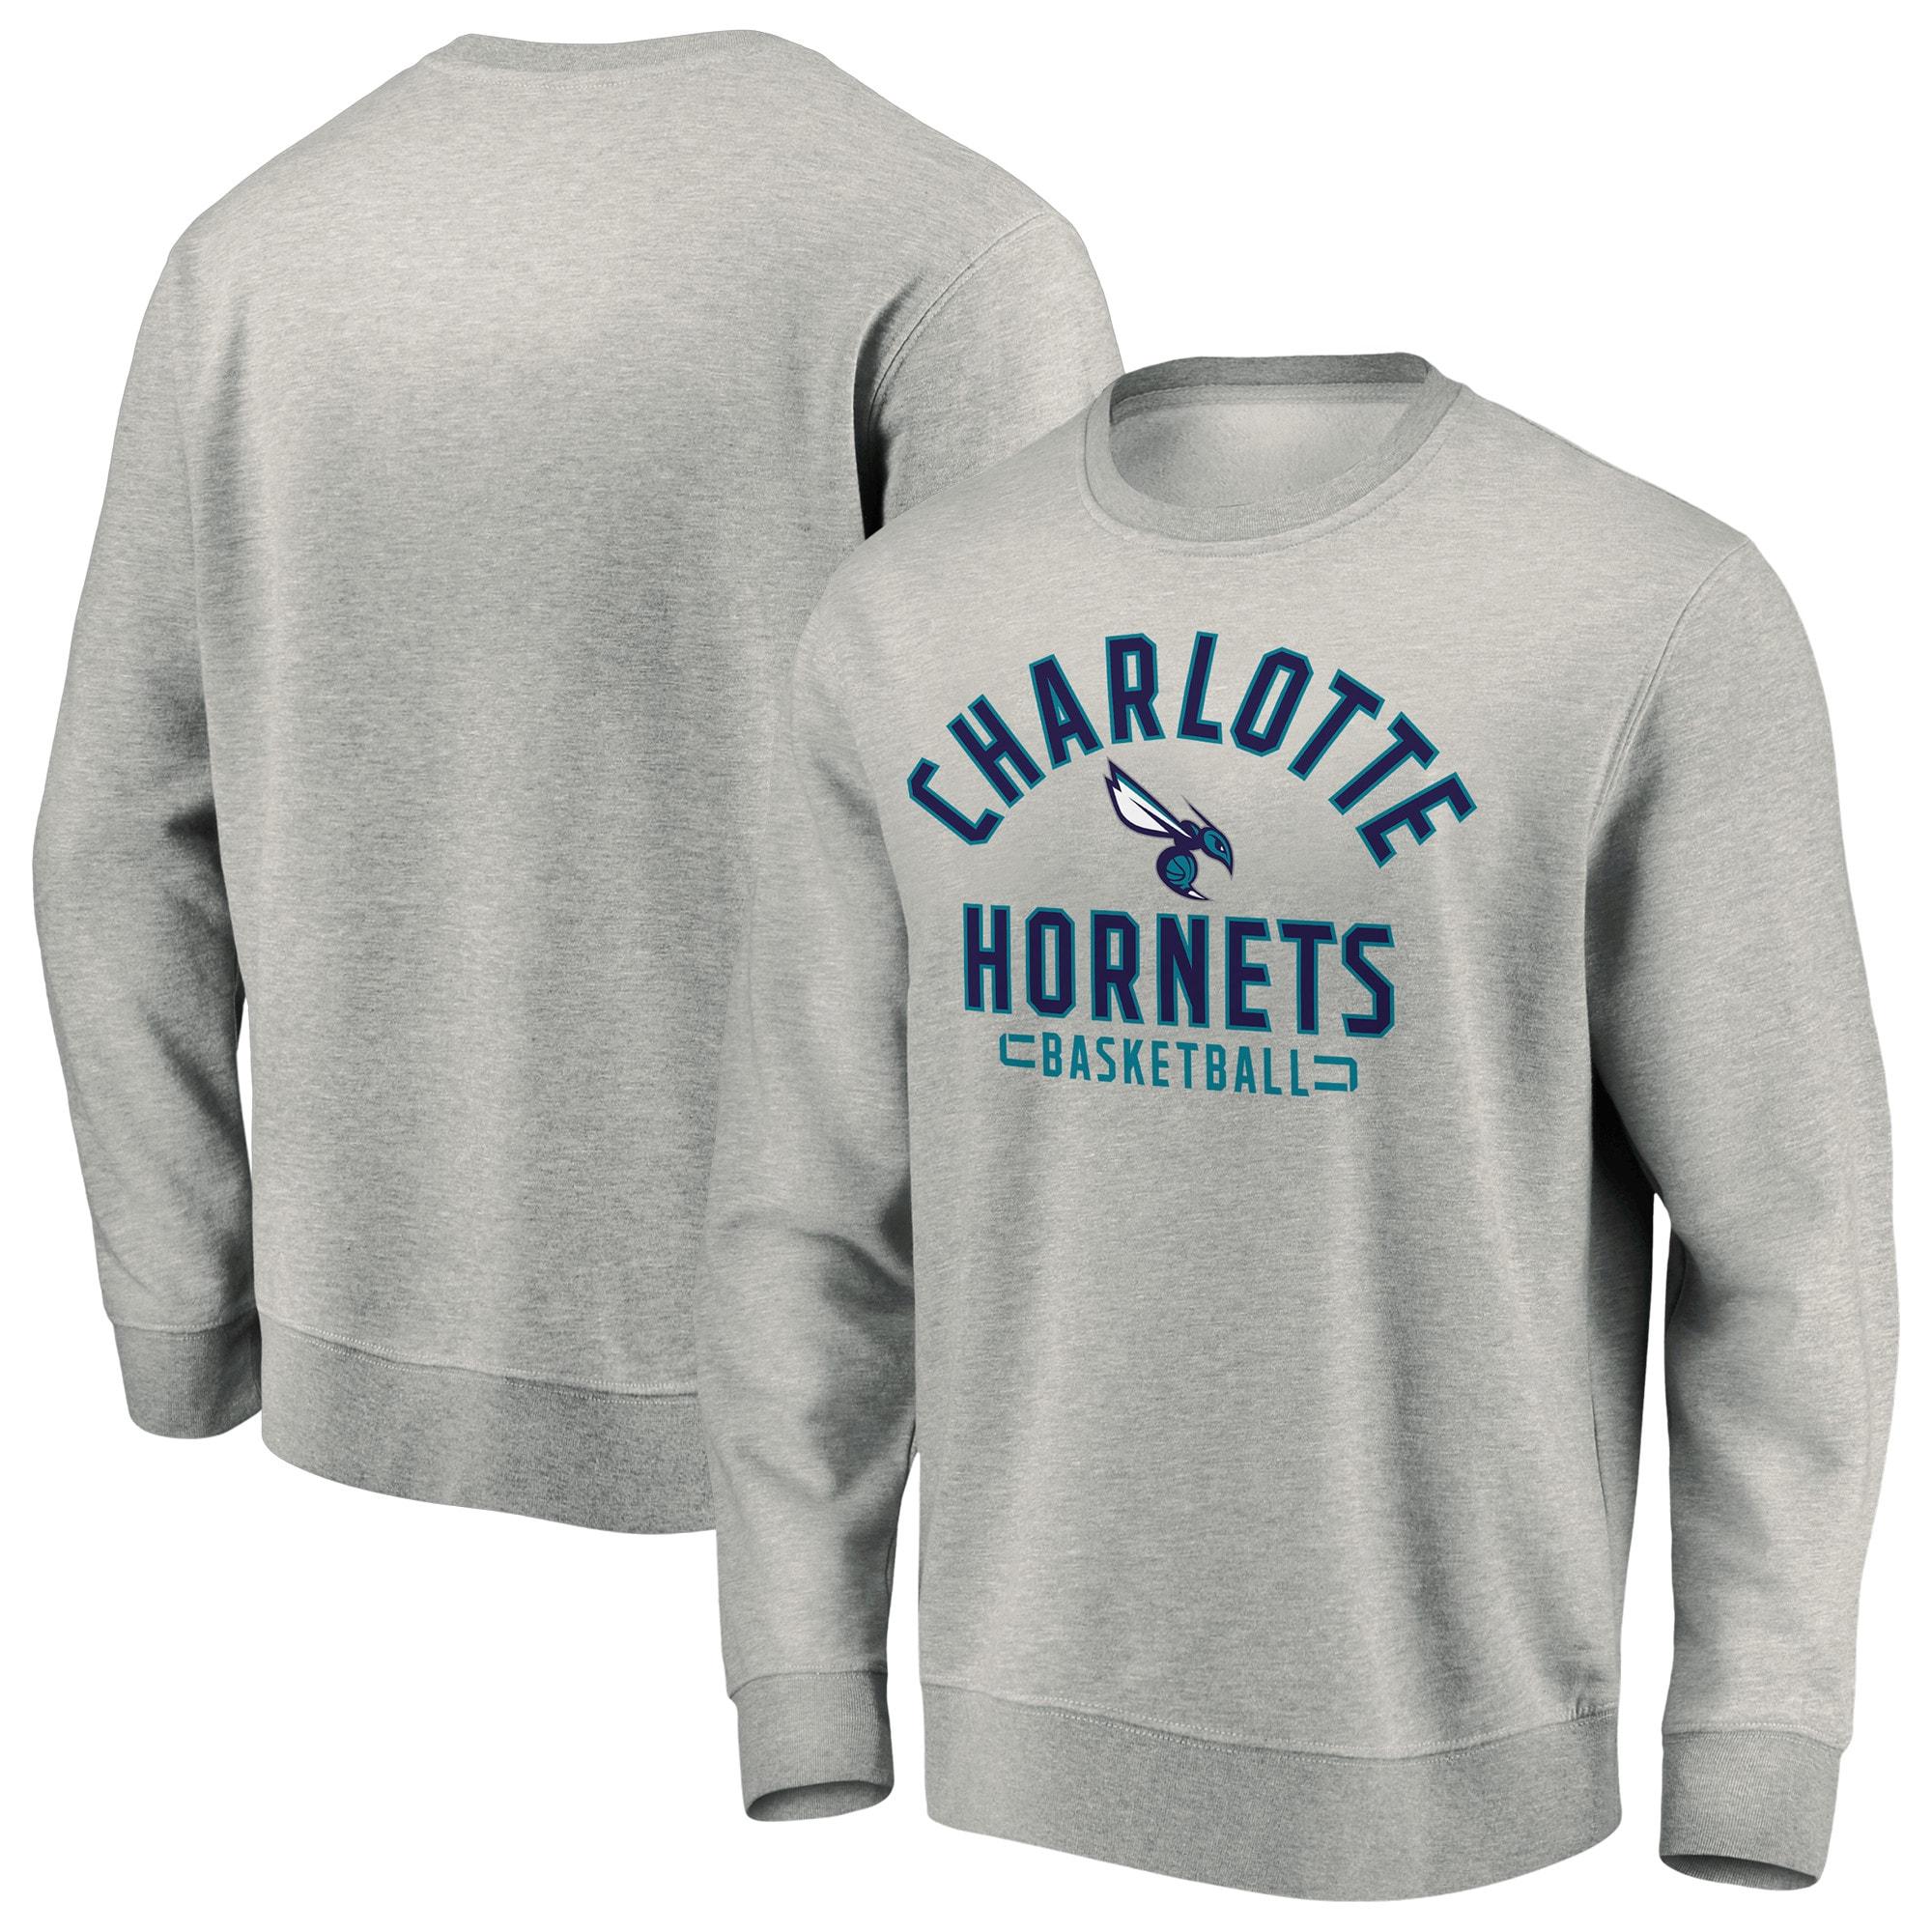 Charlotte Hornets Fanatics Branded Iconic Team Arc Stack Fleece Sweatshirt - Heathered Gray